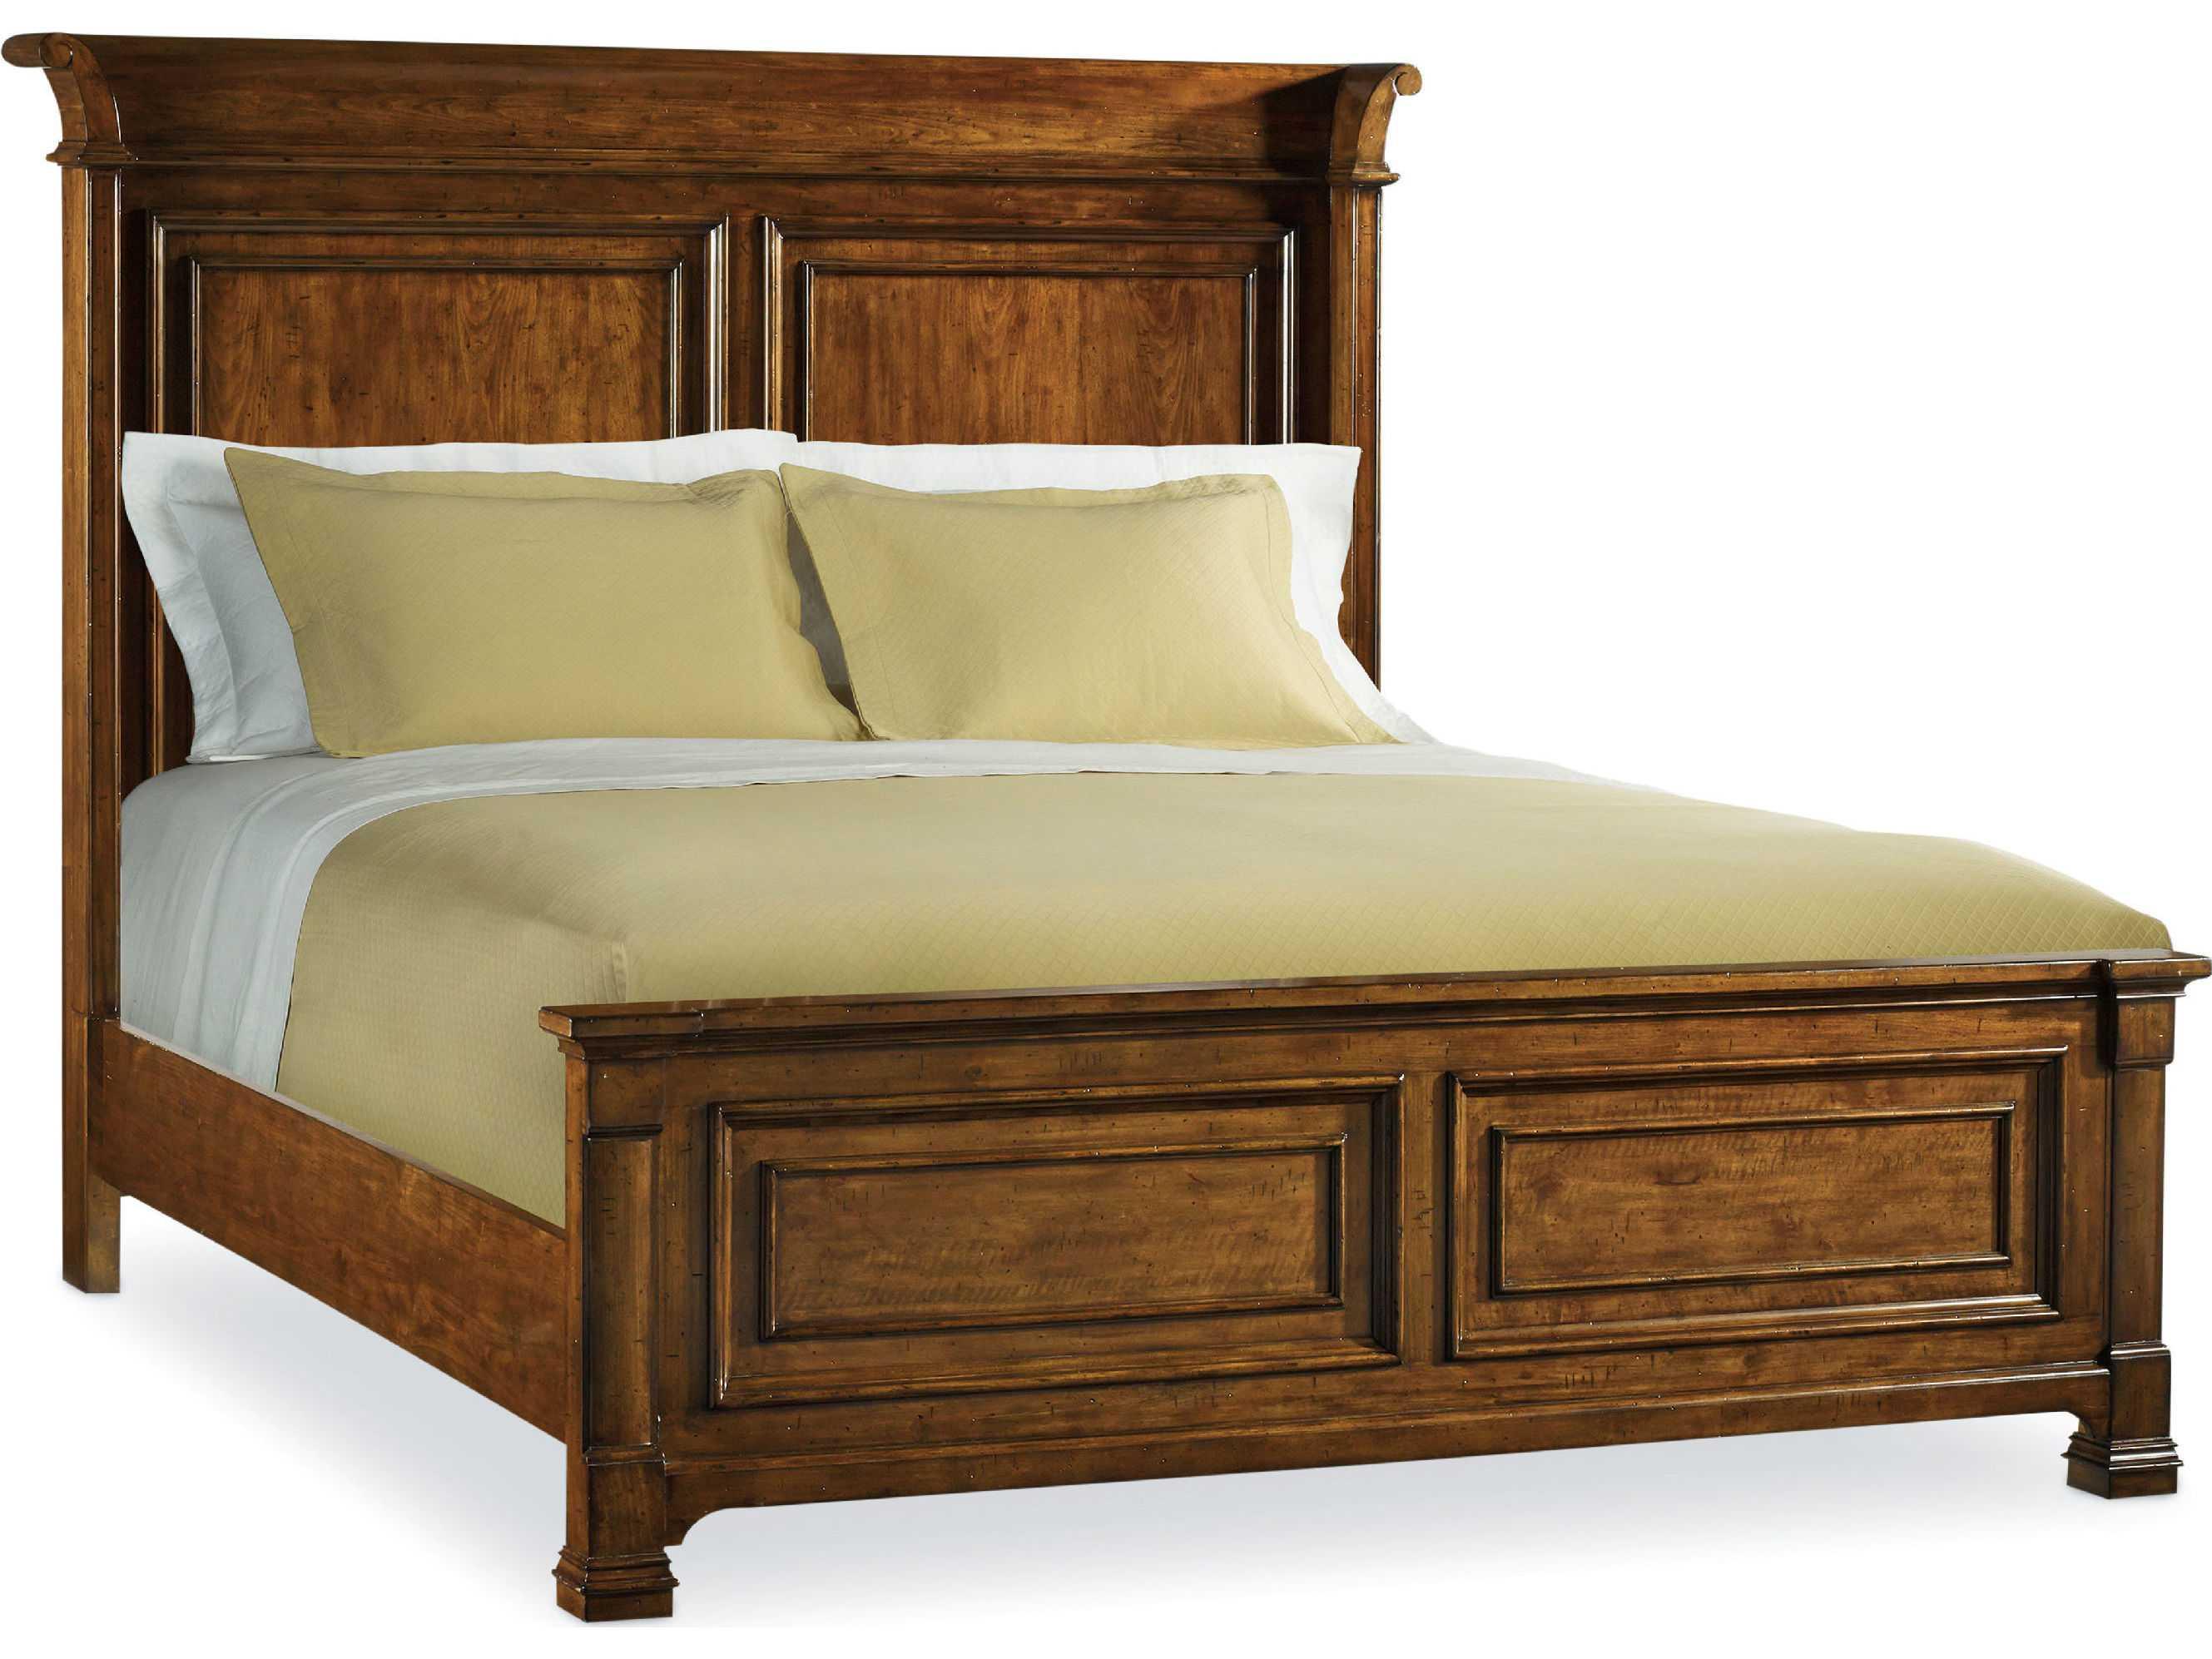 Hooker Furniture Tynecastle Medium Wood King Size Panel